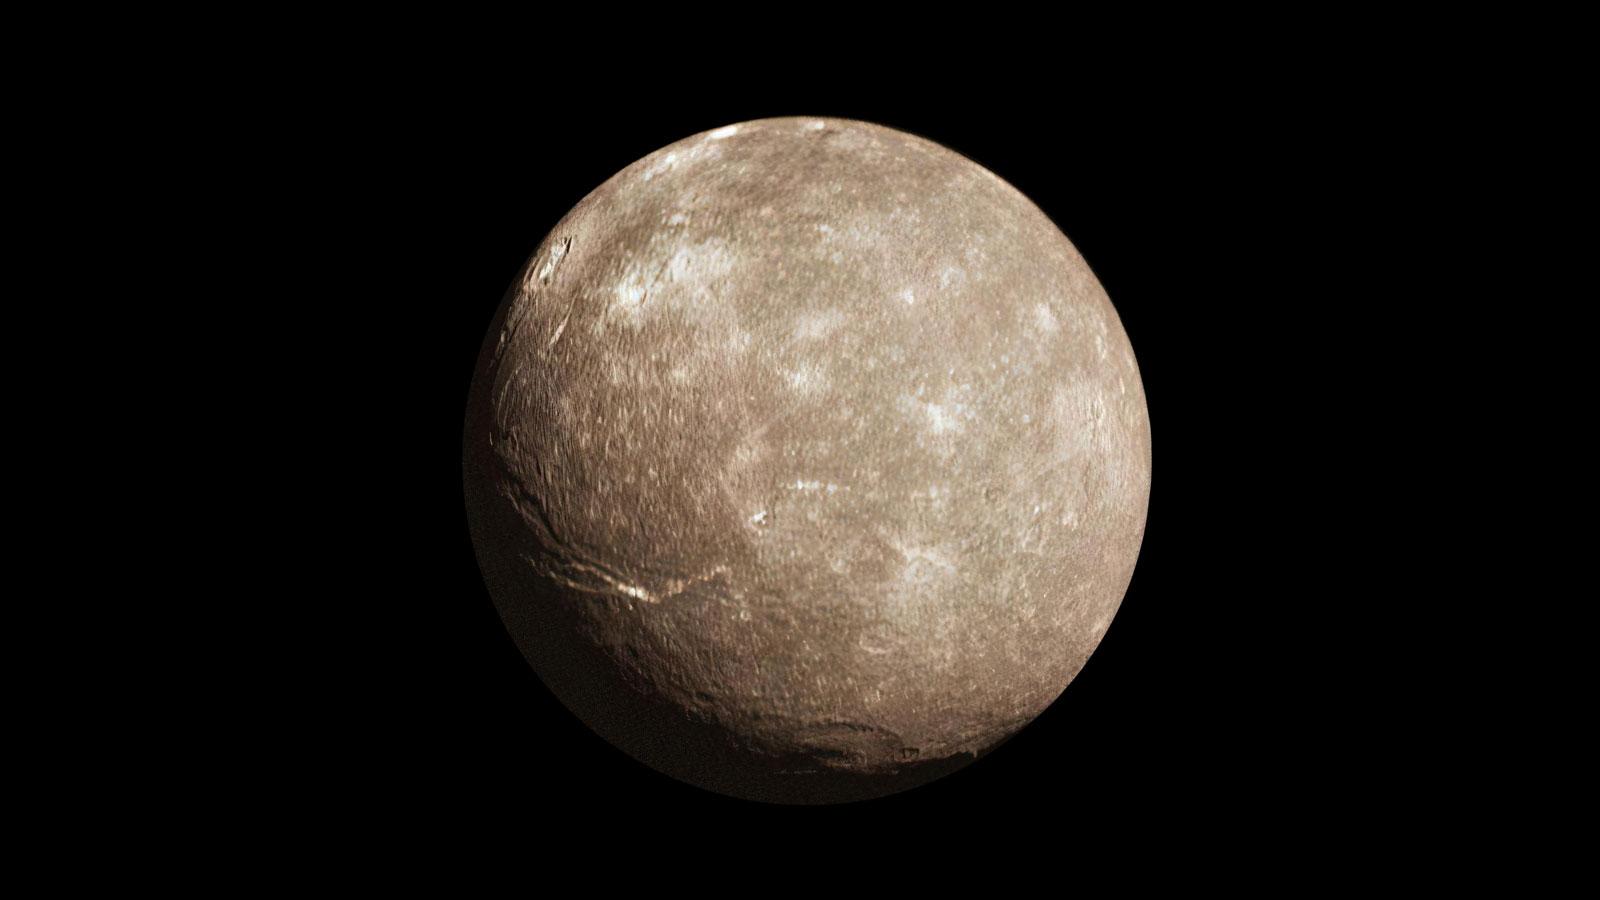 Titania facts: Uranian Moon